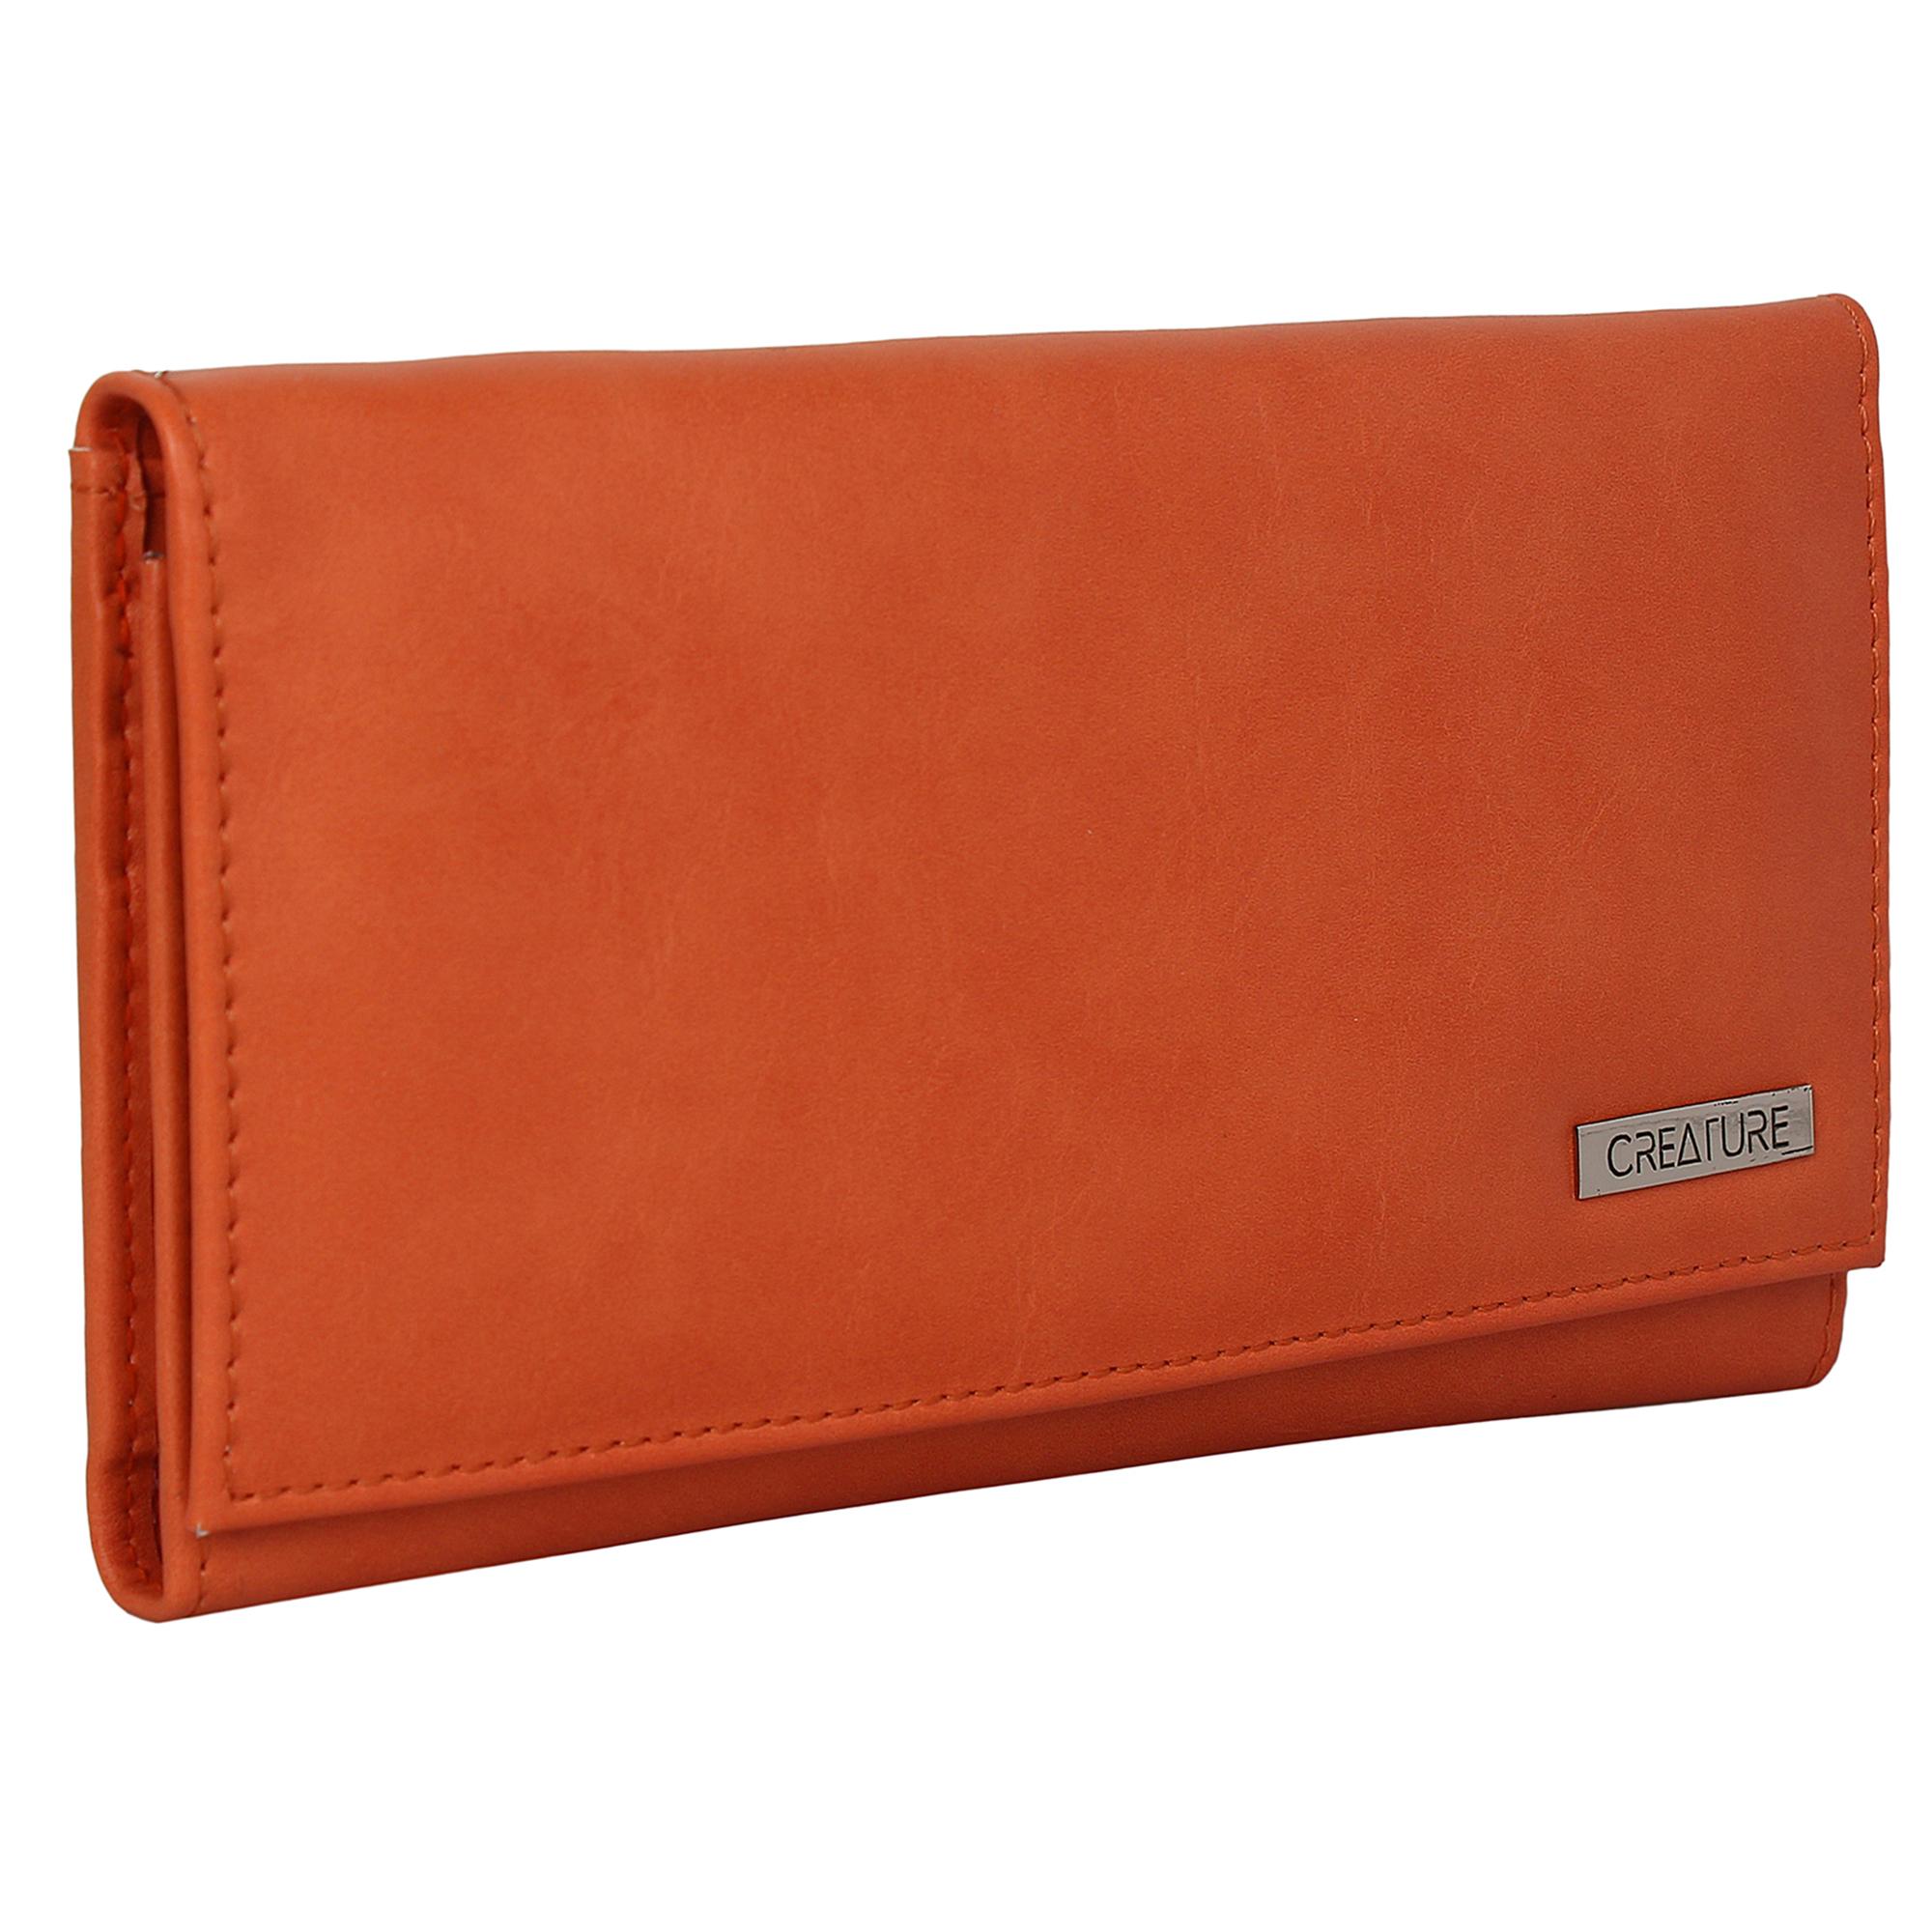 CREATURE | CREATURE Orange Stylish PU Clutch for Women